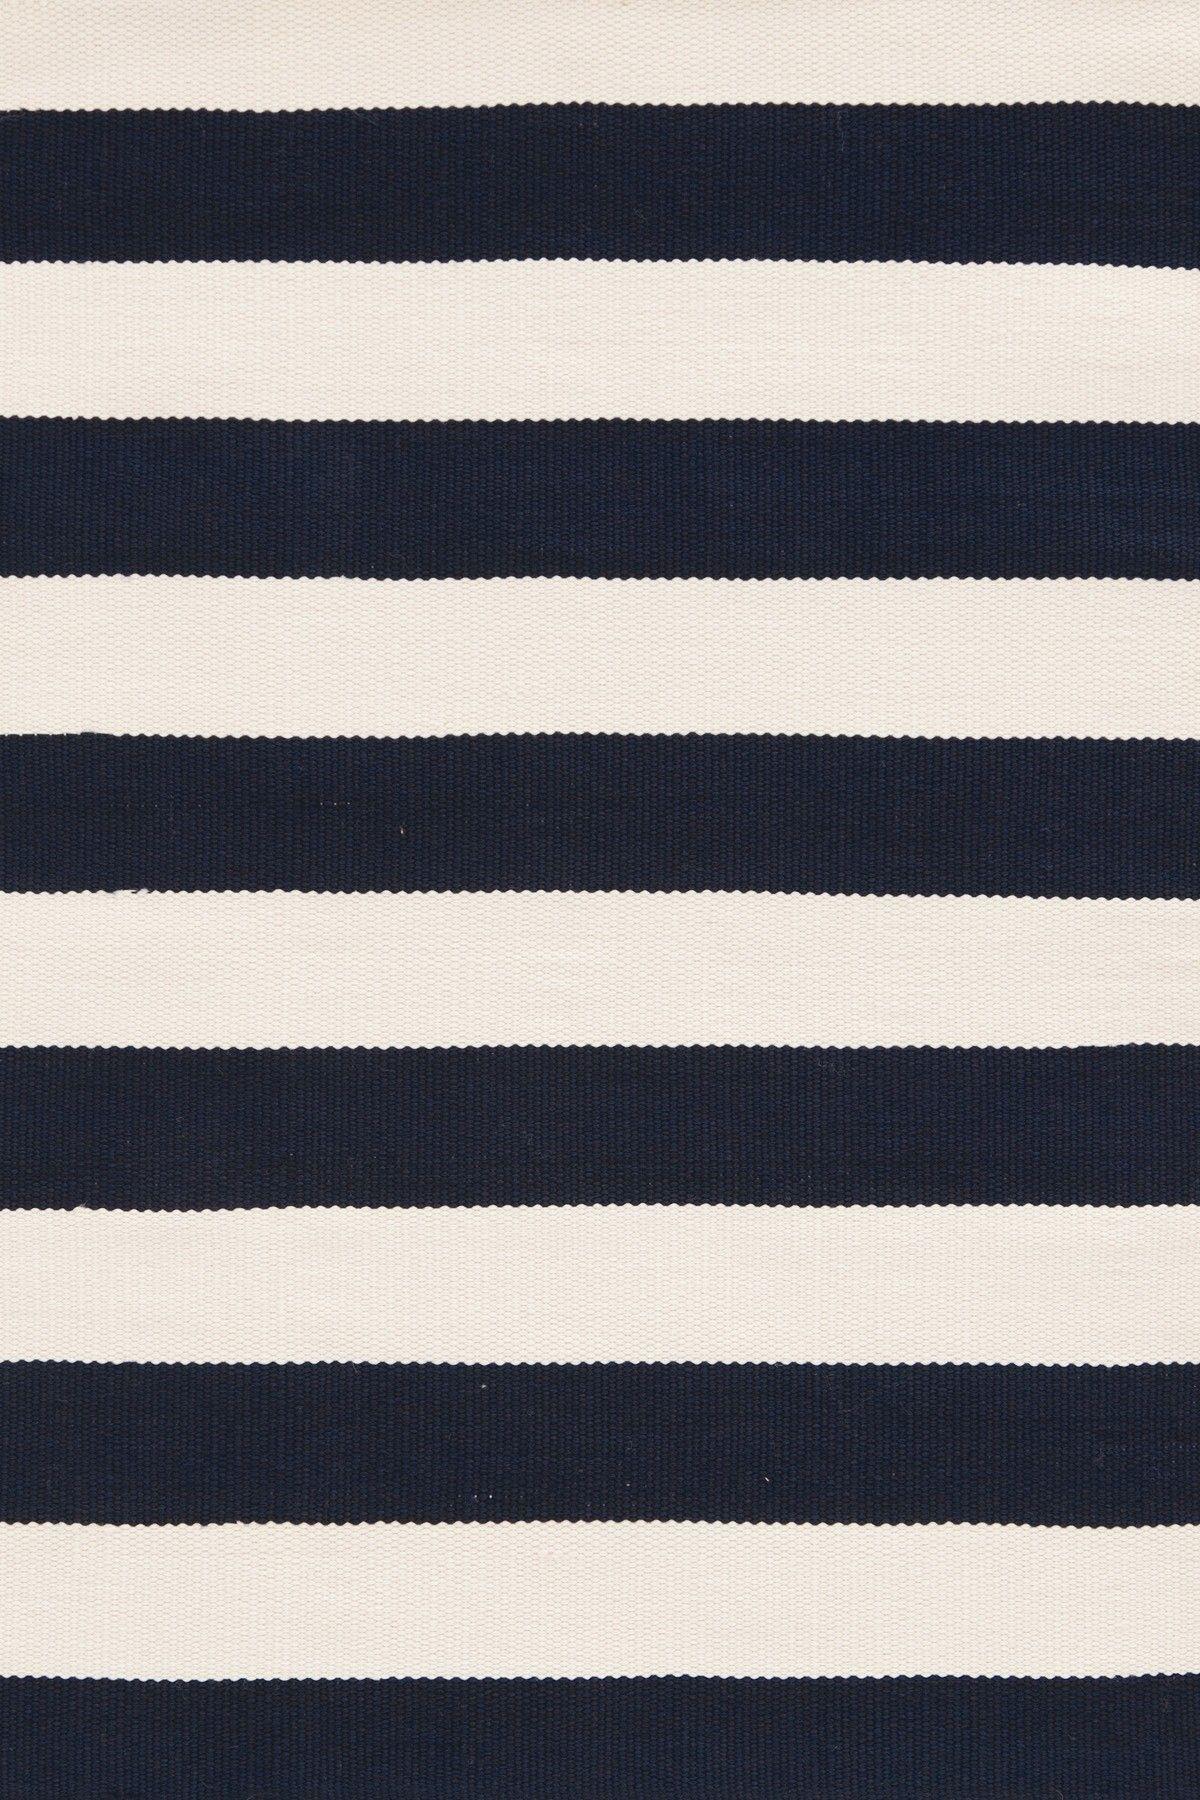 Navy White Striped Rug Dash and Albert Rugs Catamaran Indoor